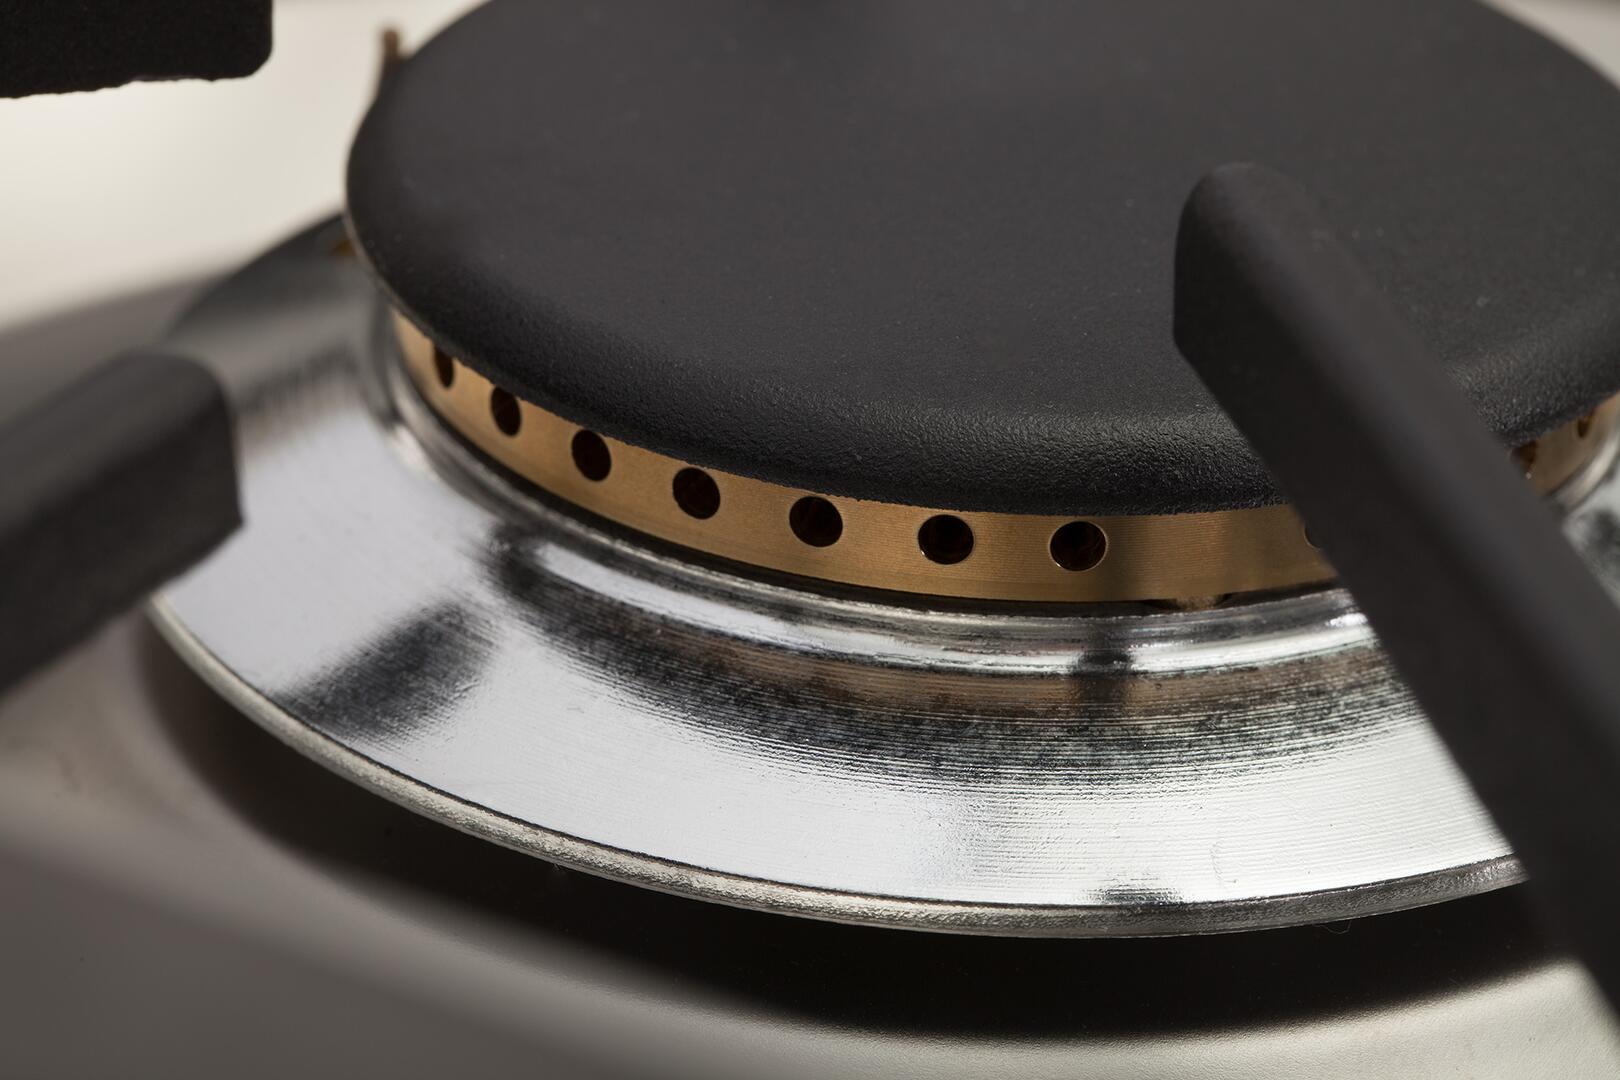 Ilve Professional Plus UPW90FDVGGB Freestanding Gas Range White, 15